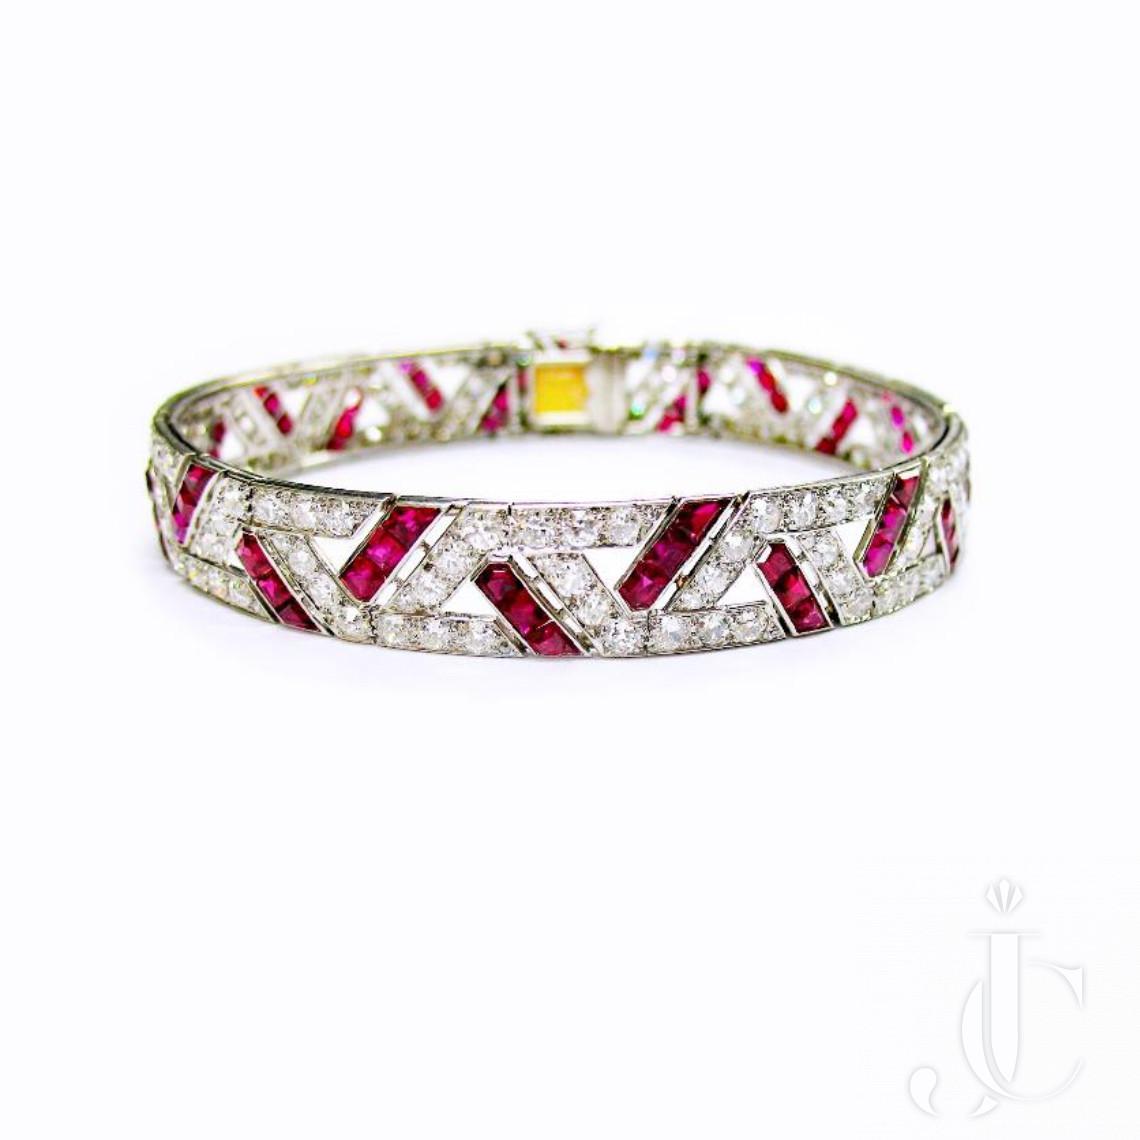 Platinum Art Deco Ruby and Diamond Bangle Bracelet, French, circa 1930